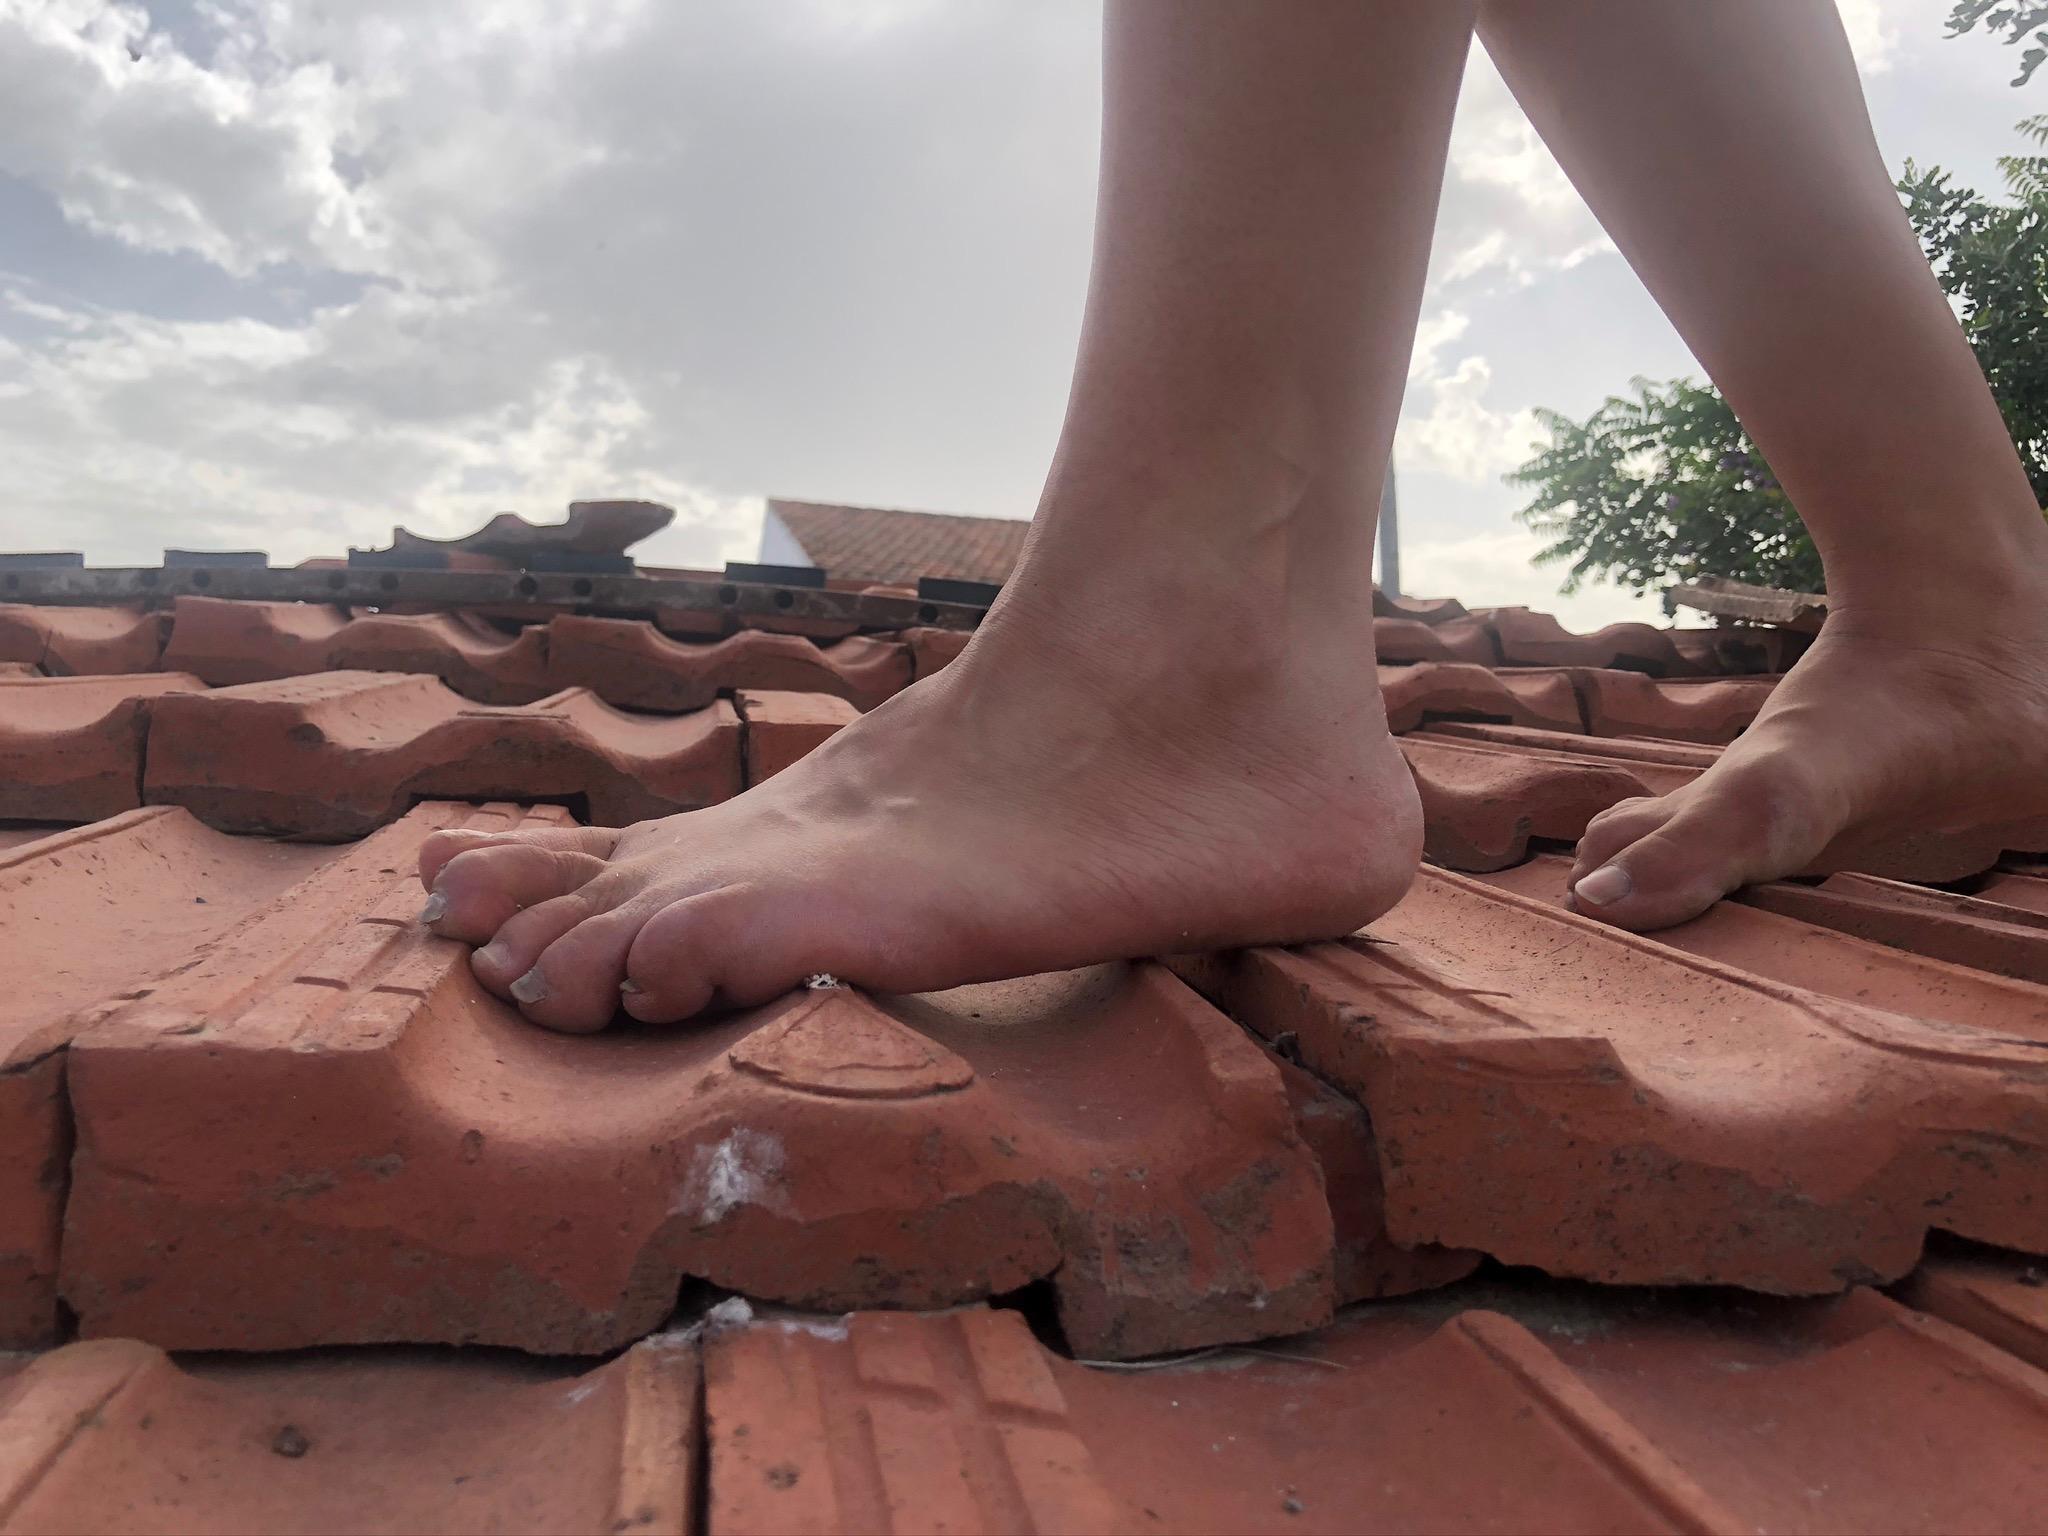 on the brick Evie Demetriou